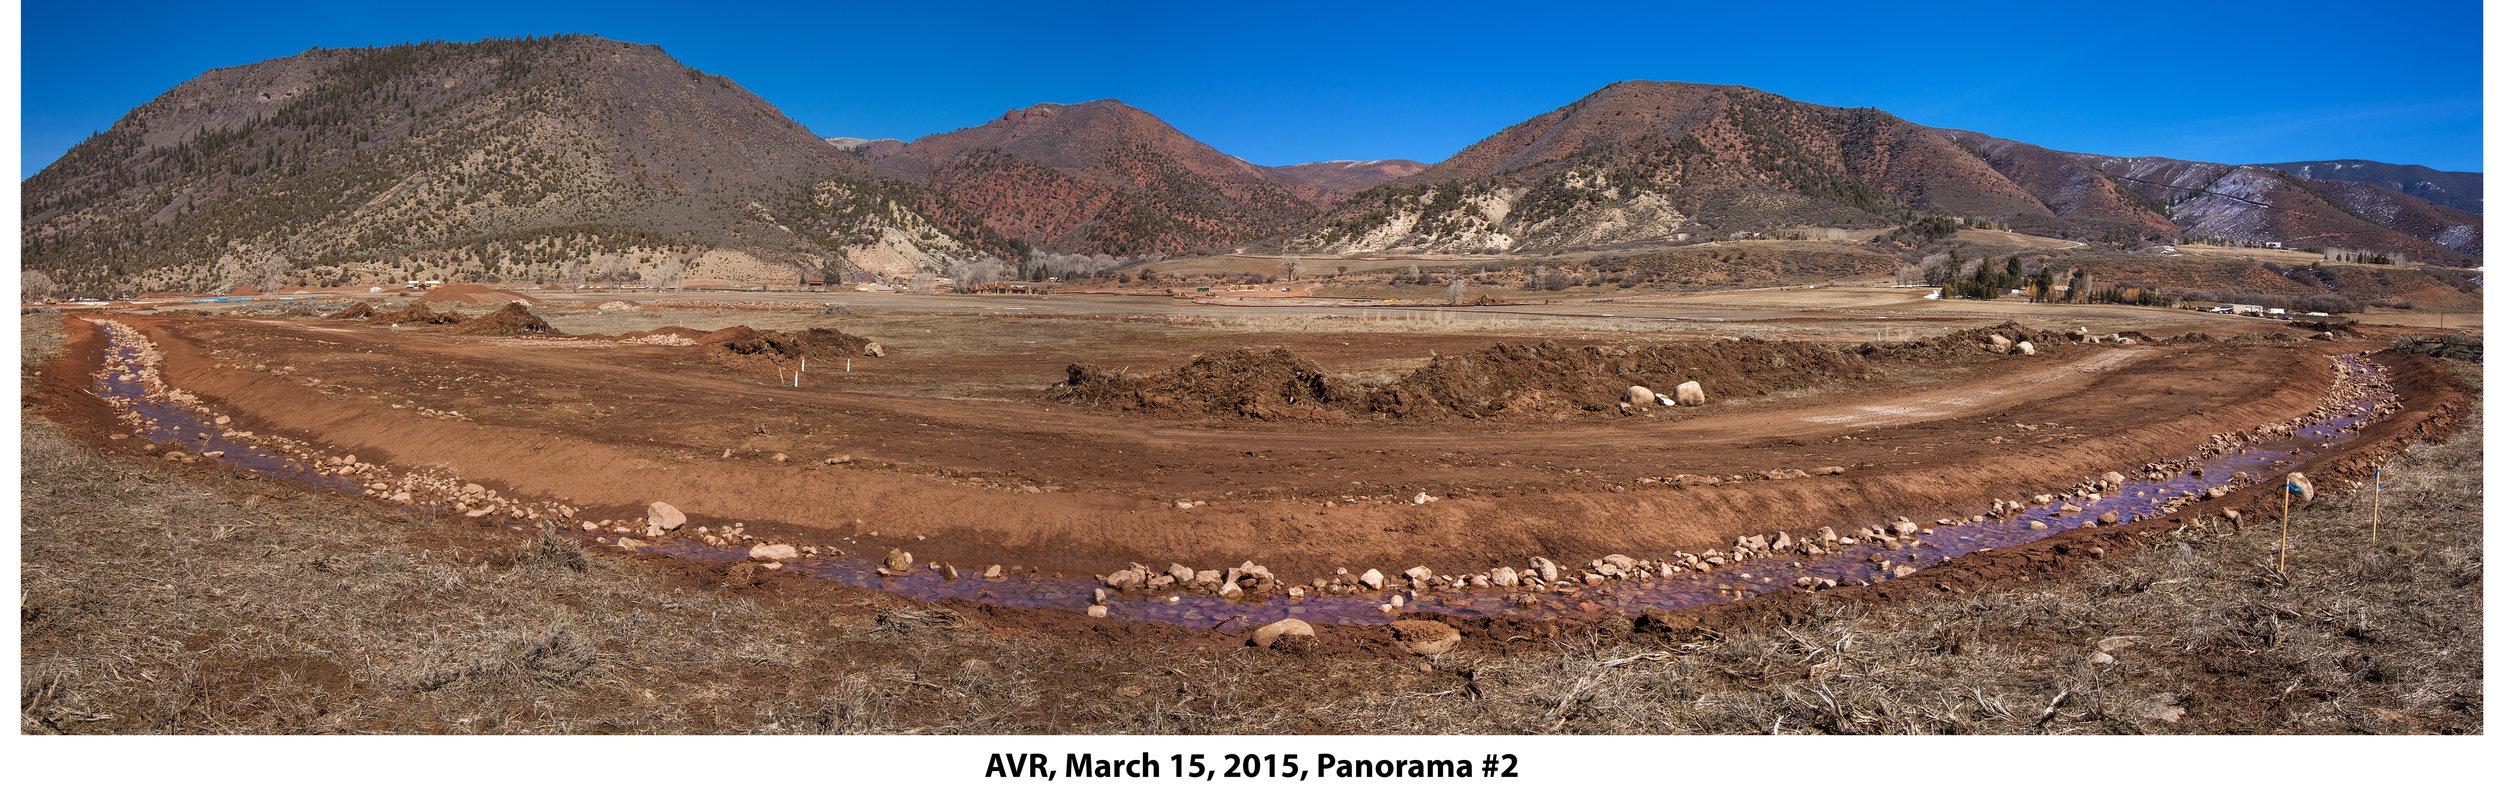 titled_Panorama2.jpg